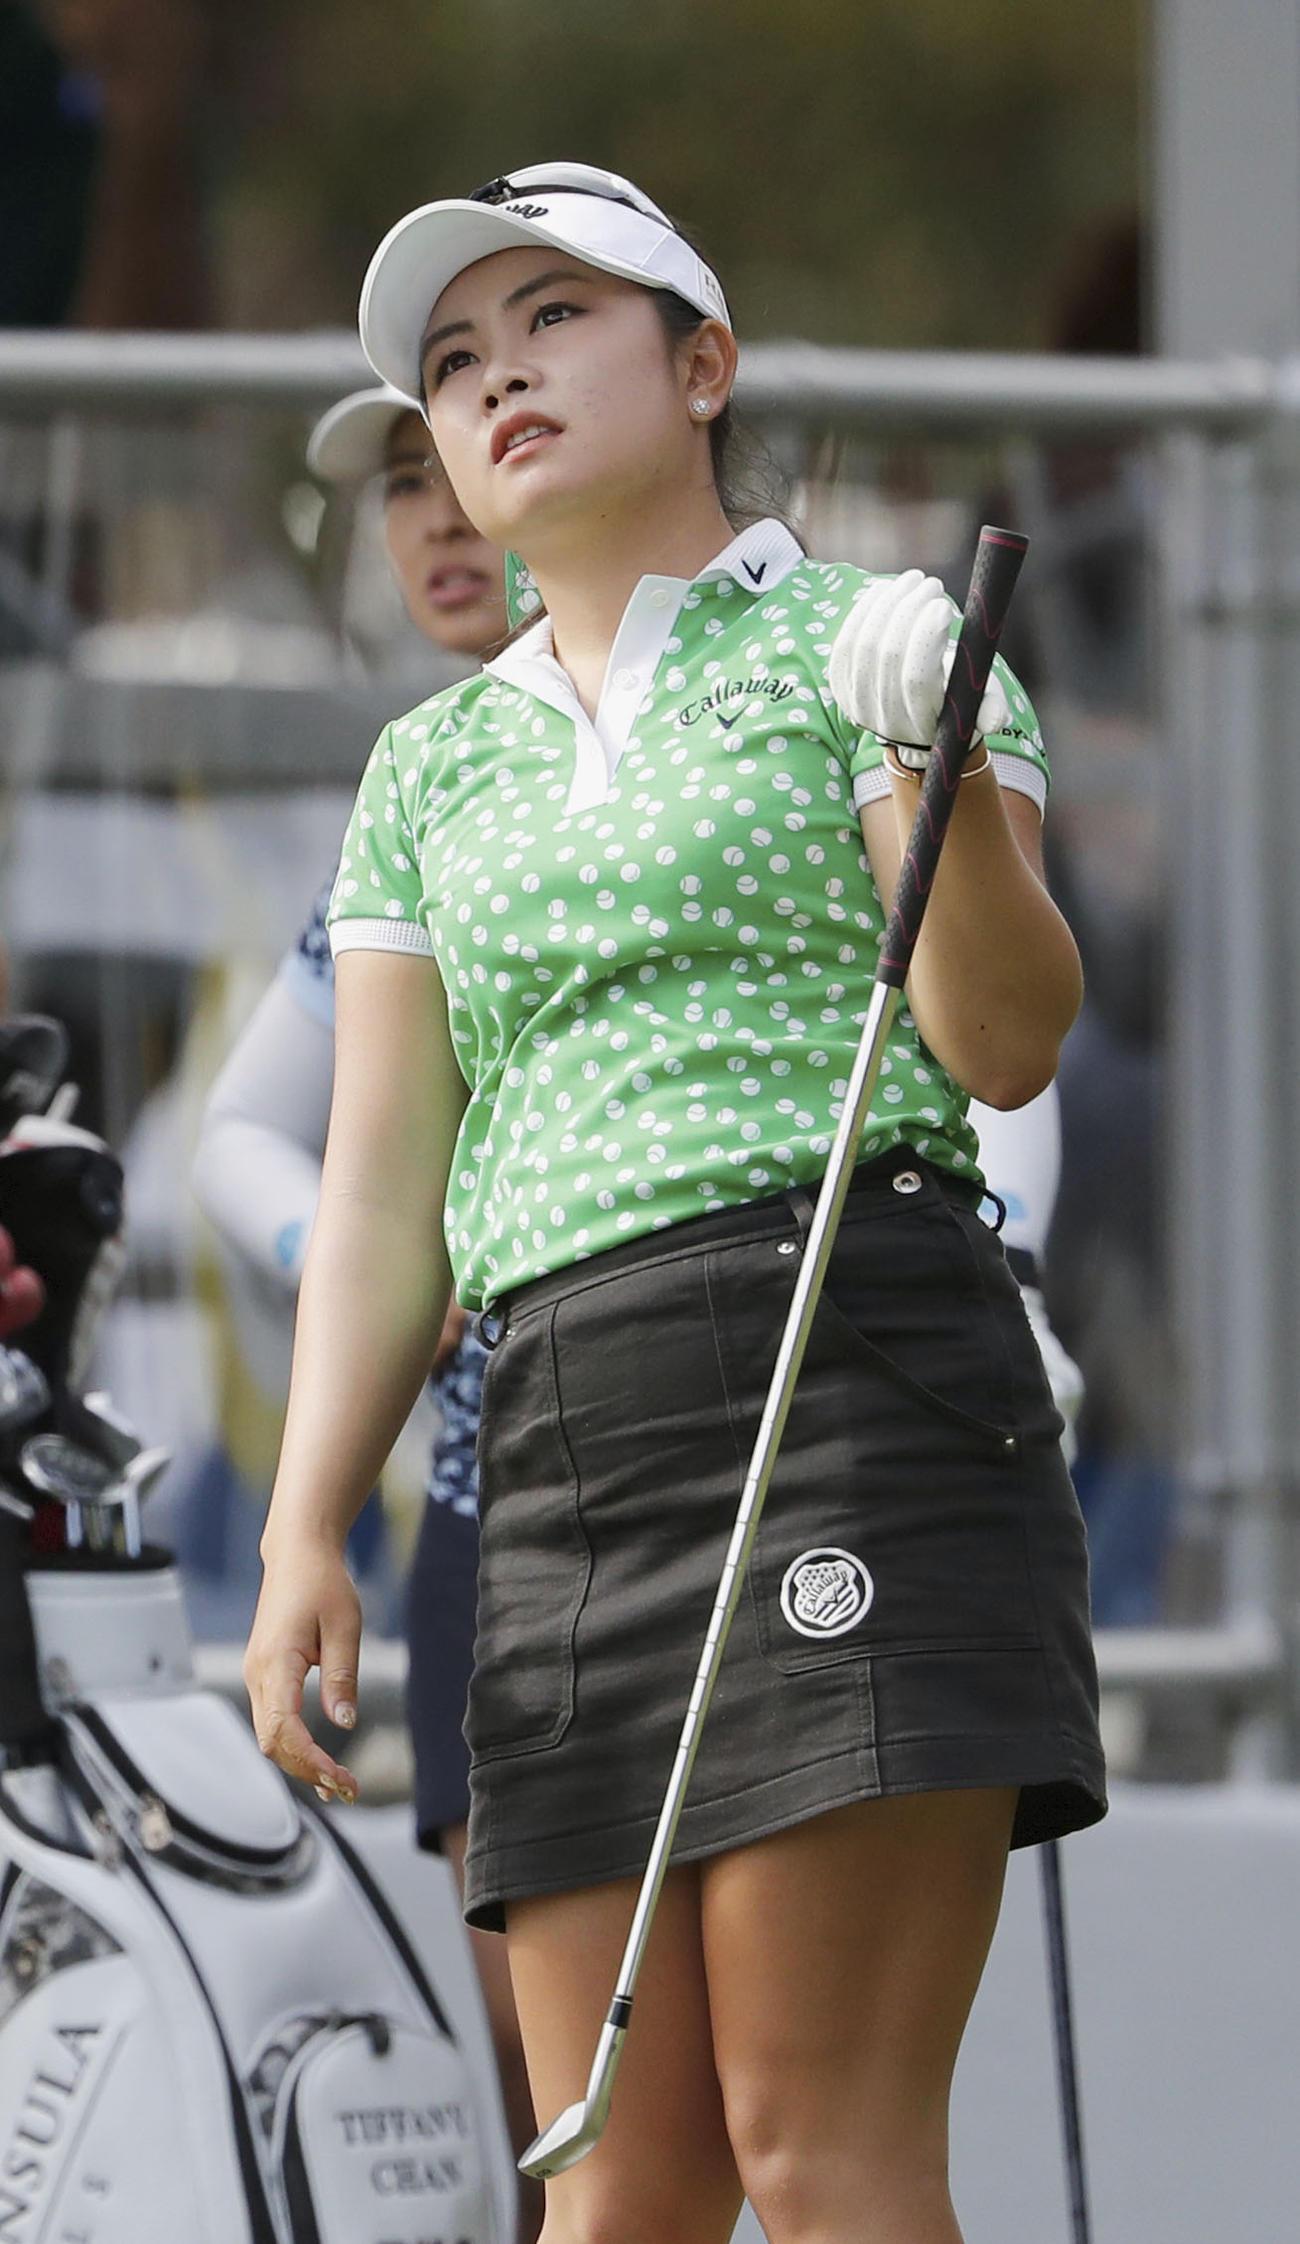 https://www.nikkansports.com/sports/golf/news/img/202001250000069-w1300_0.jpg